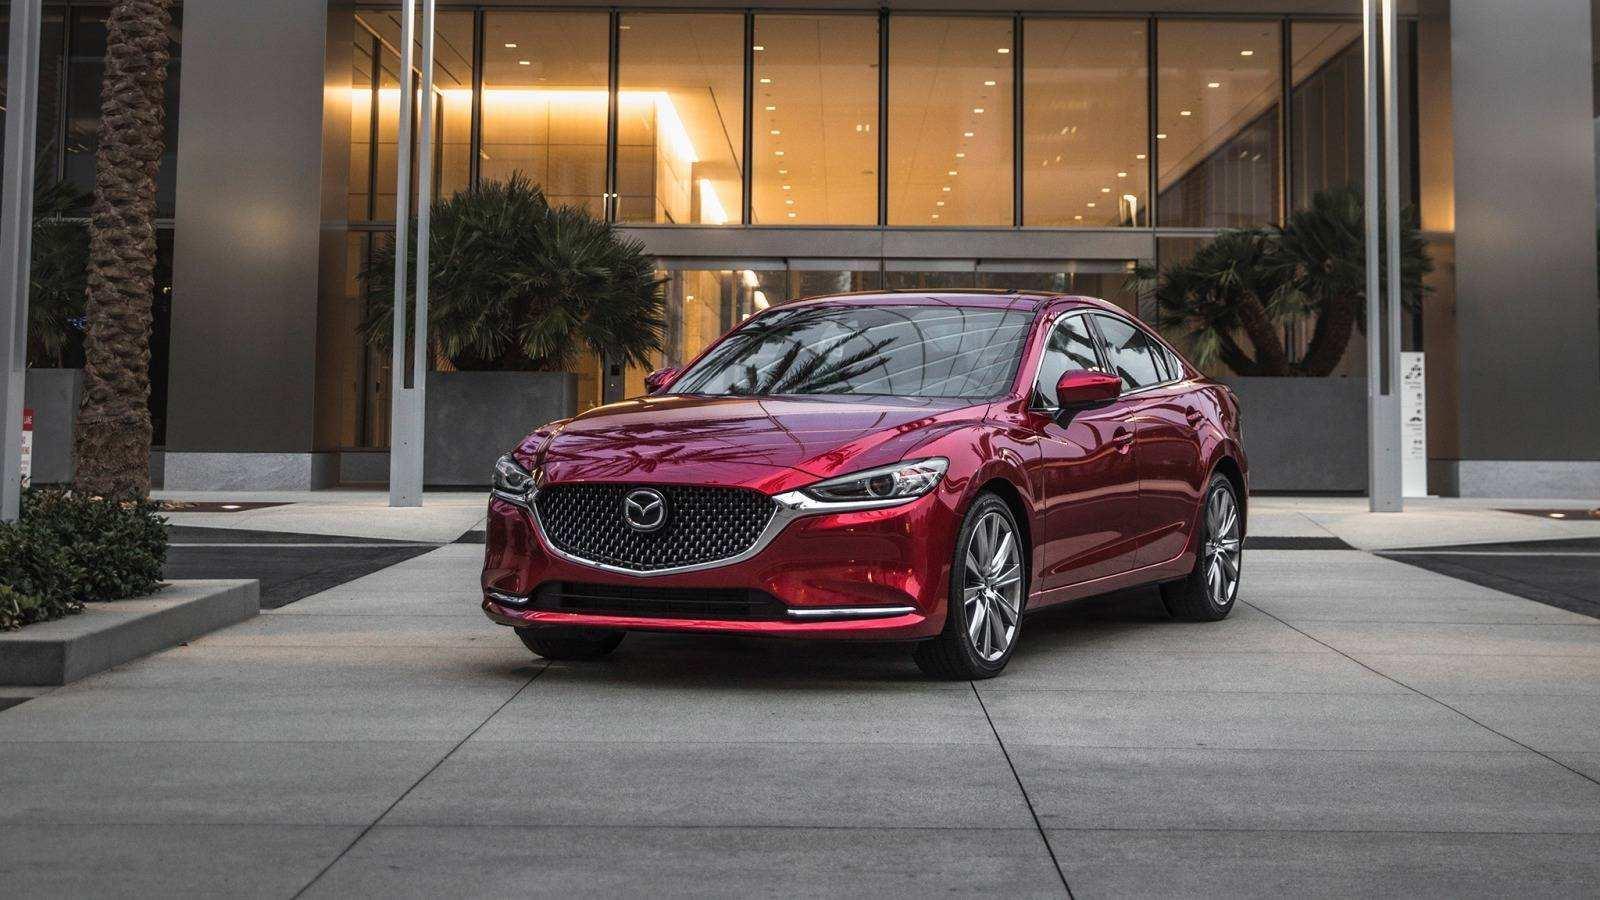 84 Concept of Mazda 6 2020 Hp Concept for Mazda 6 2020 Hp